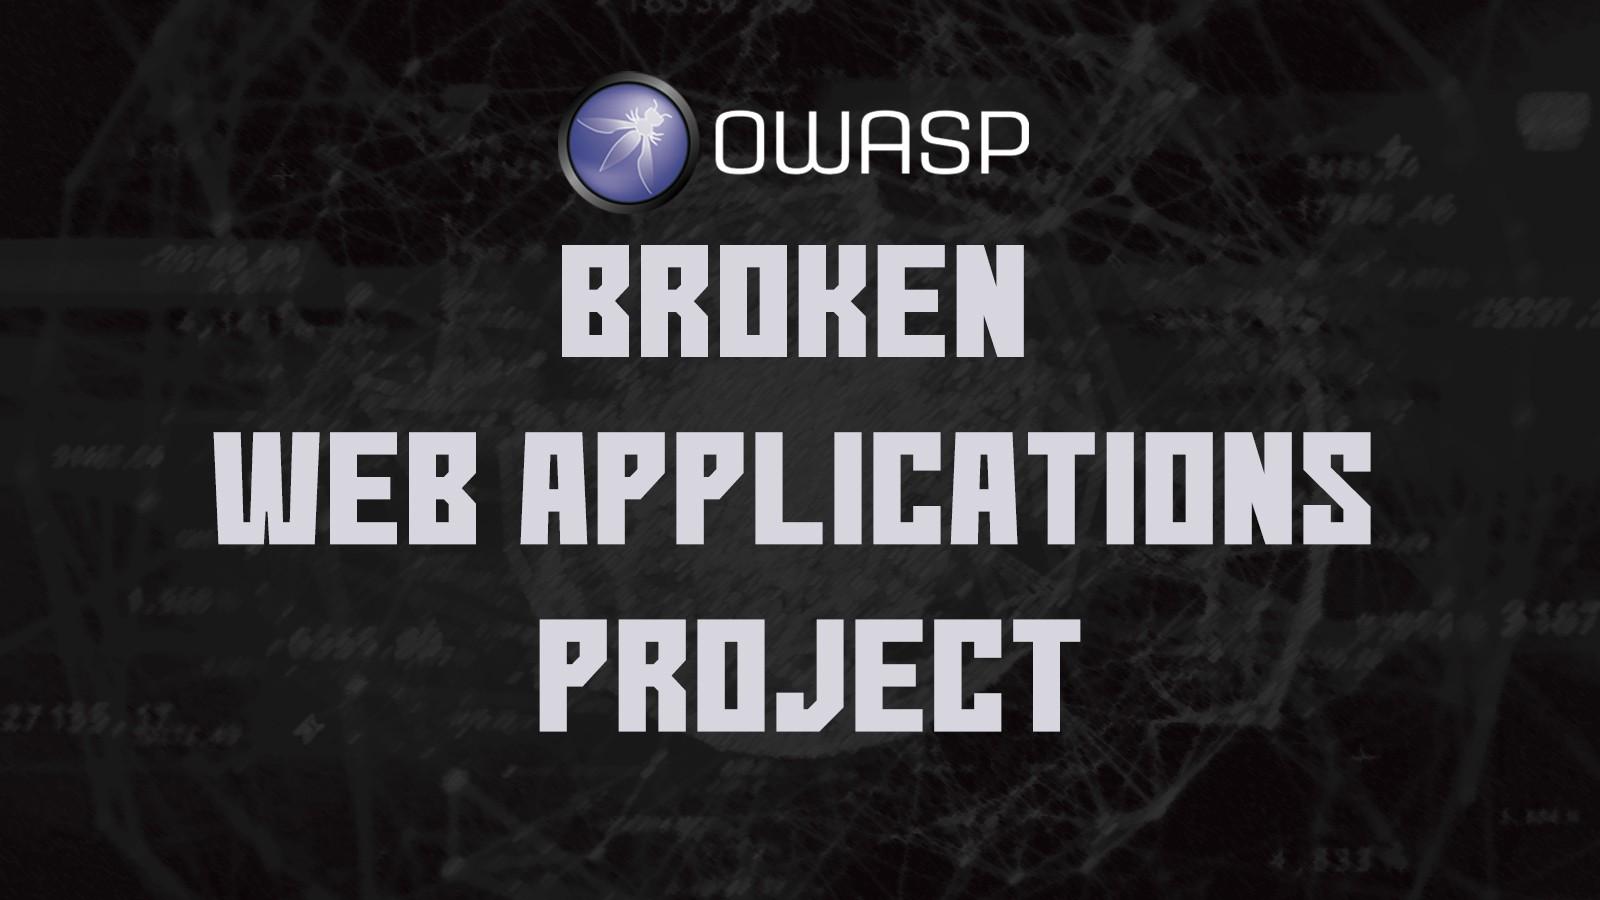 Установка OWASP Broken Web Applications Project